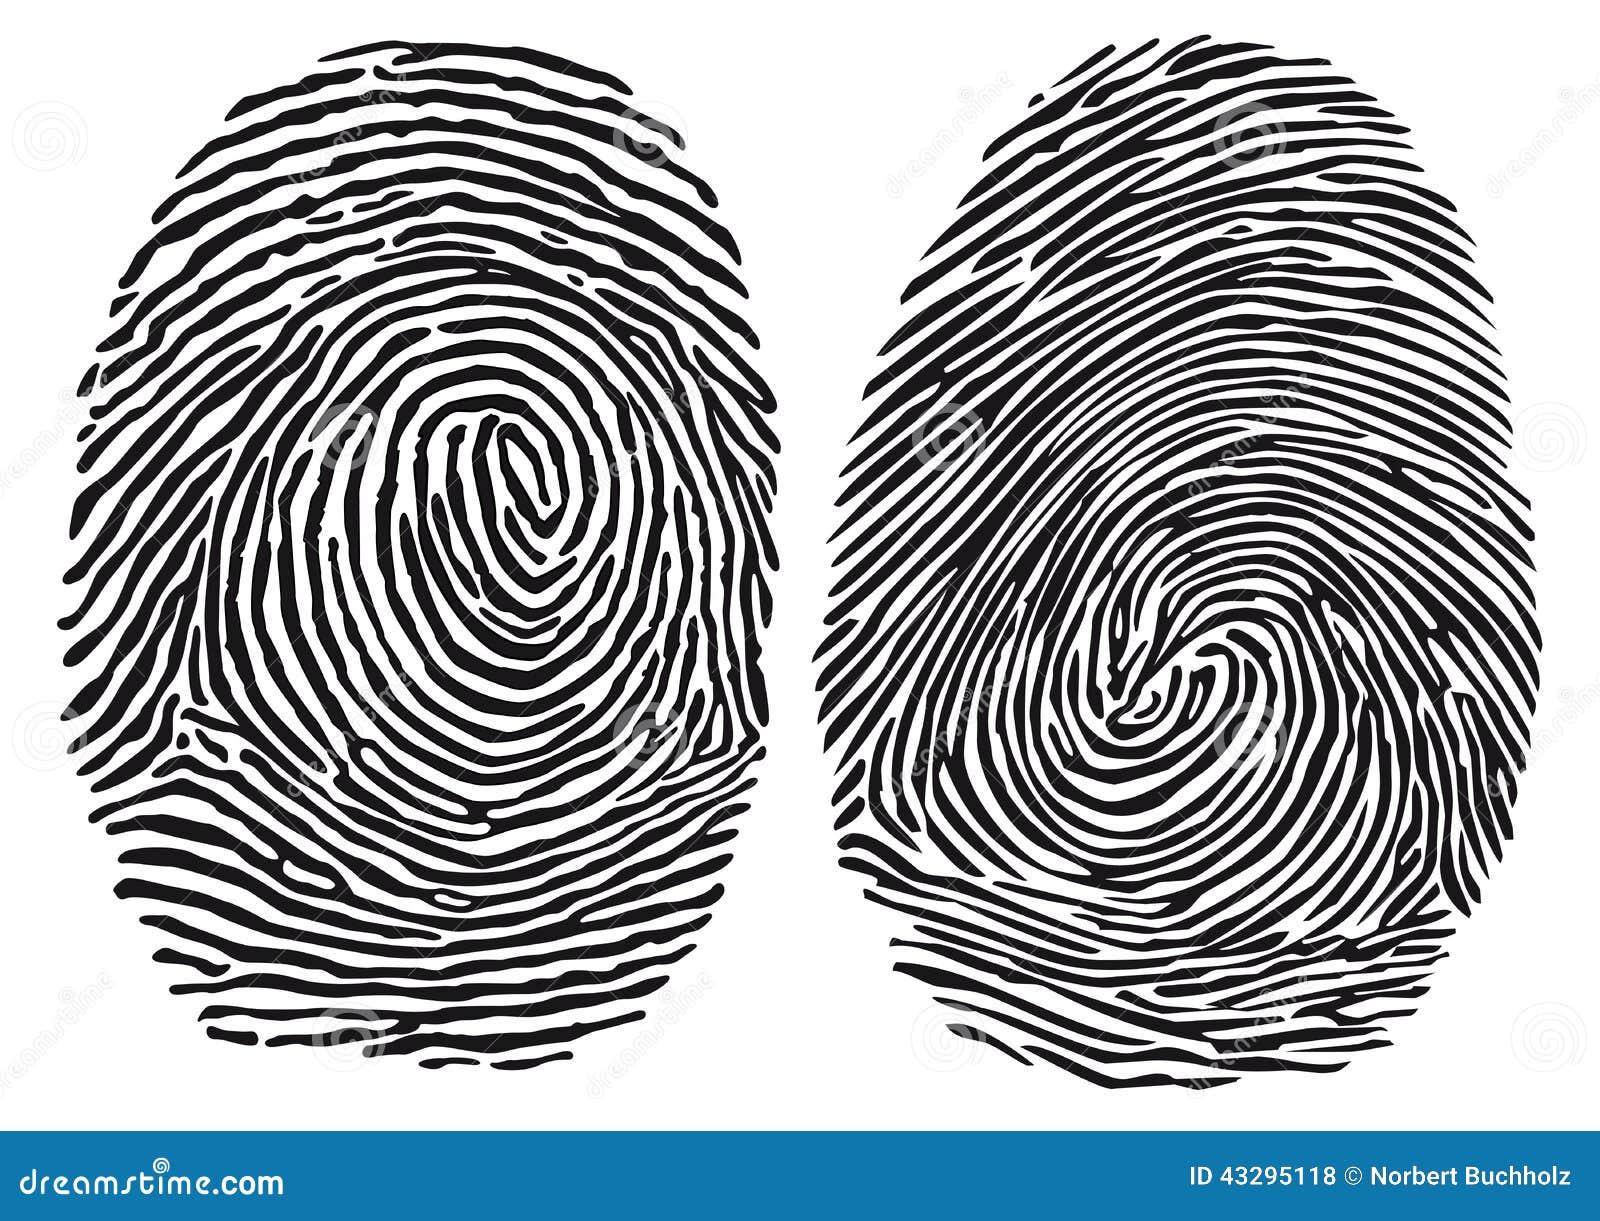 Fingerprints Stock Vector. Illustration Of Loops